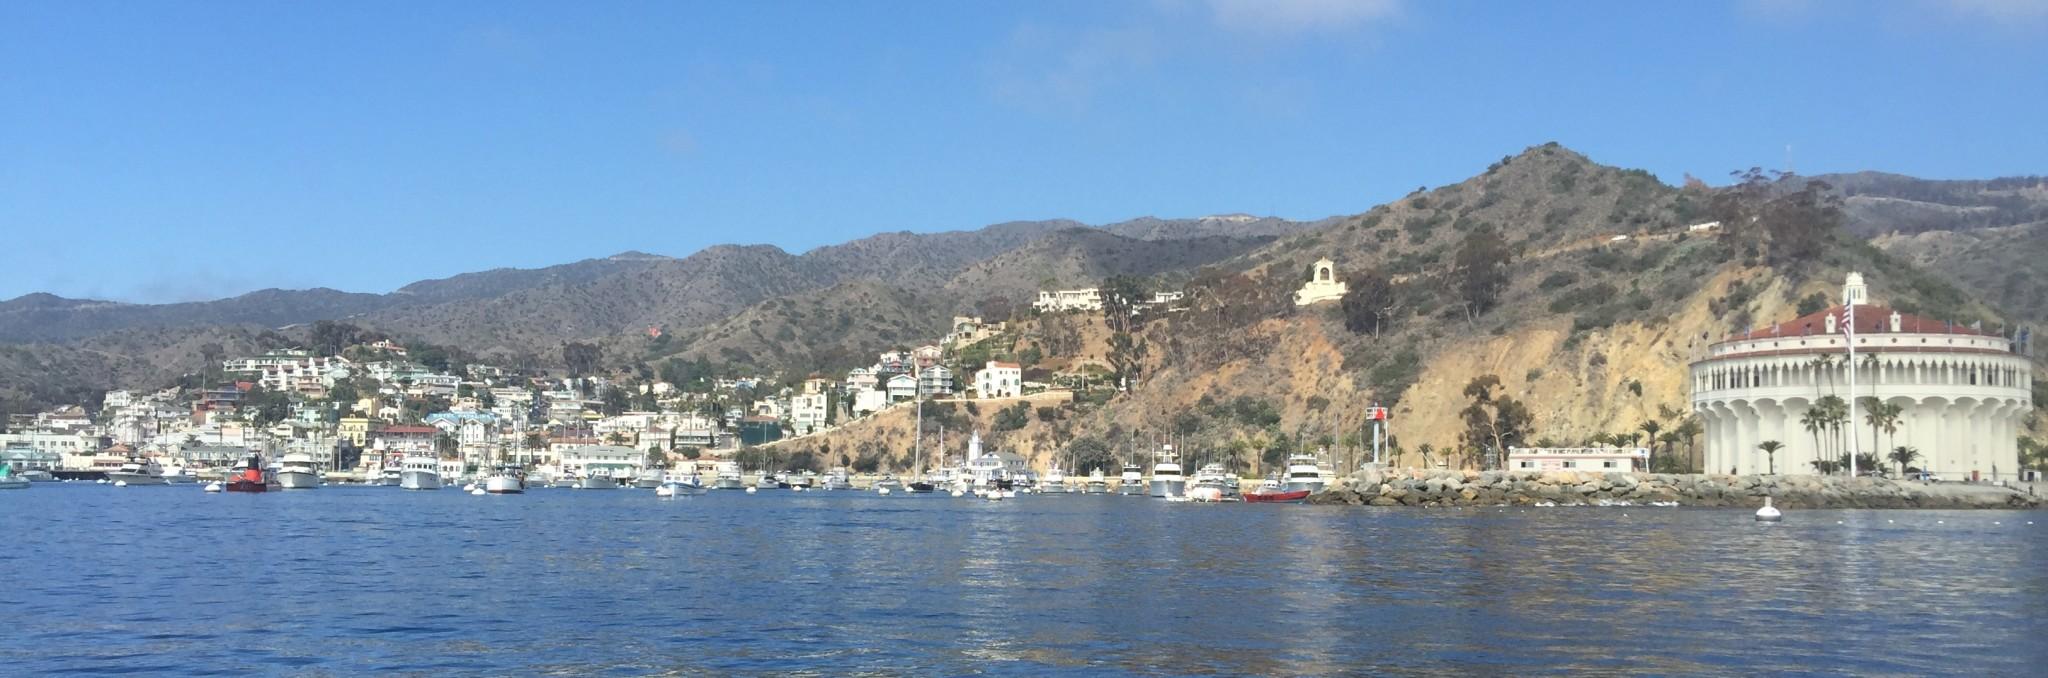 Catalina Island Getaways Southern California Fishing